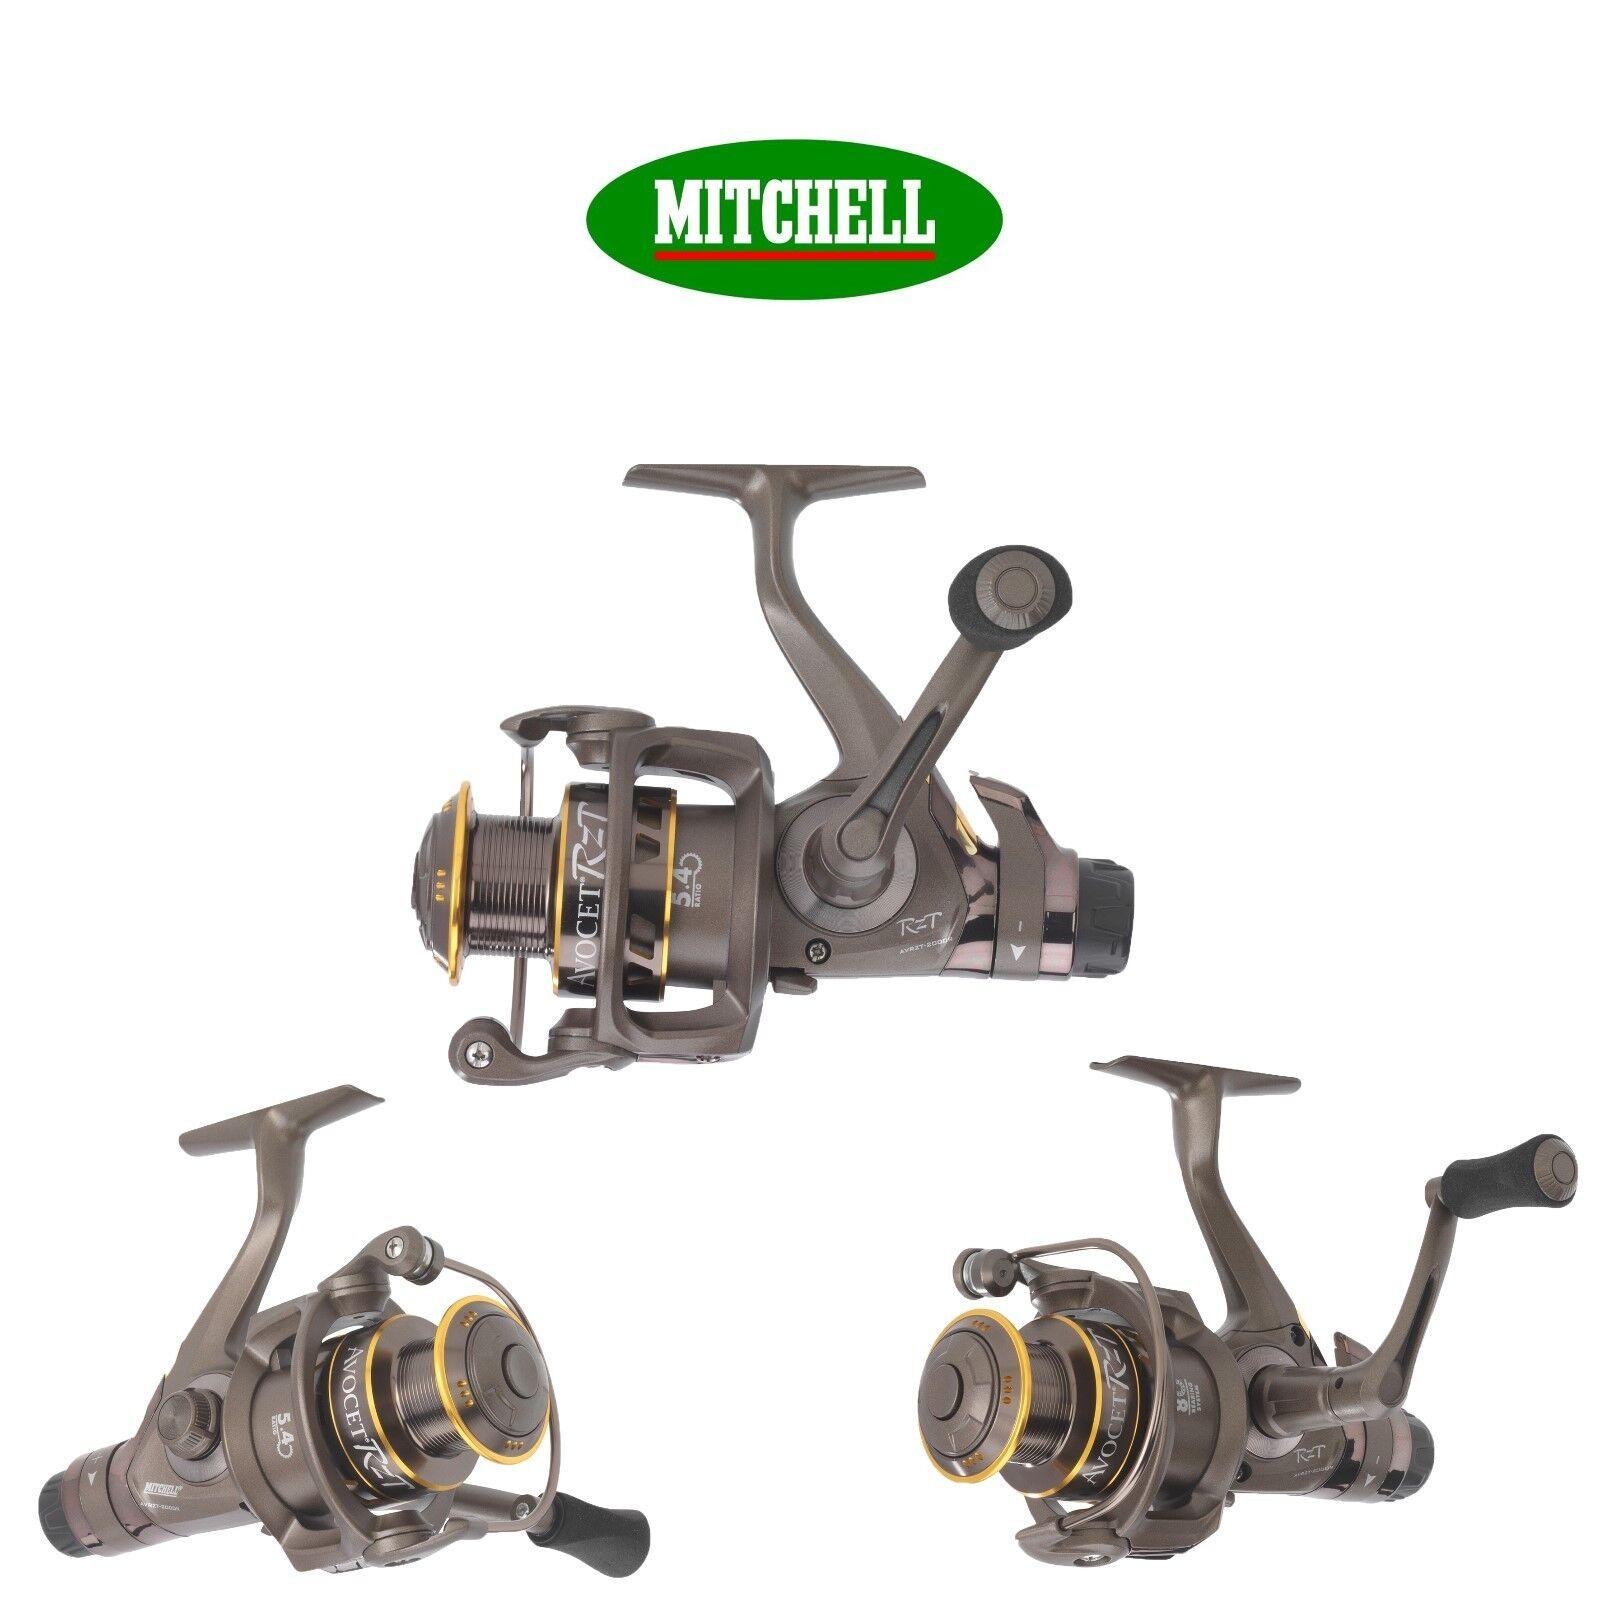 Mitchell Avocet Rzt Cocherete Giro 2 Modelos Partido Grueso Juego Pesca de Cochepa